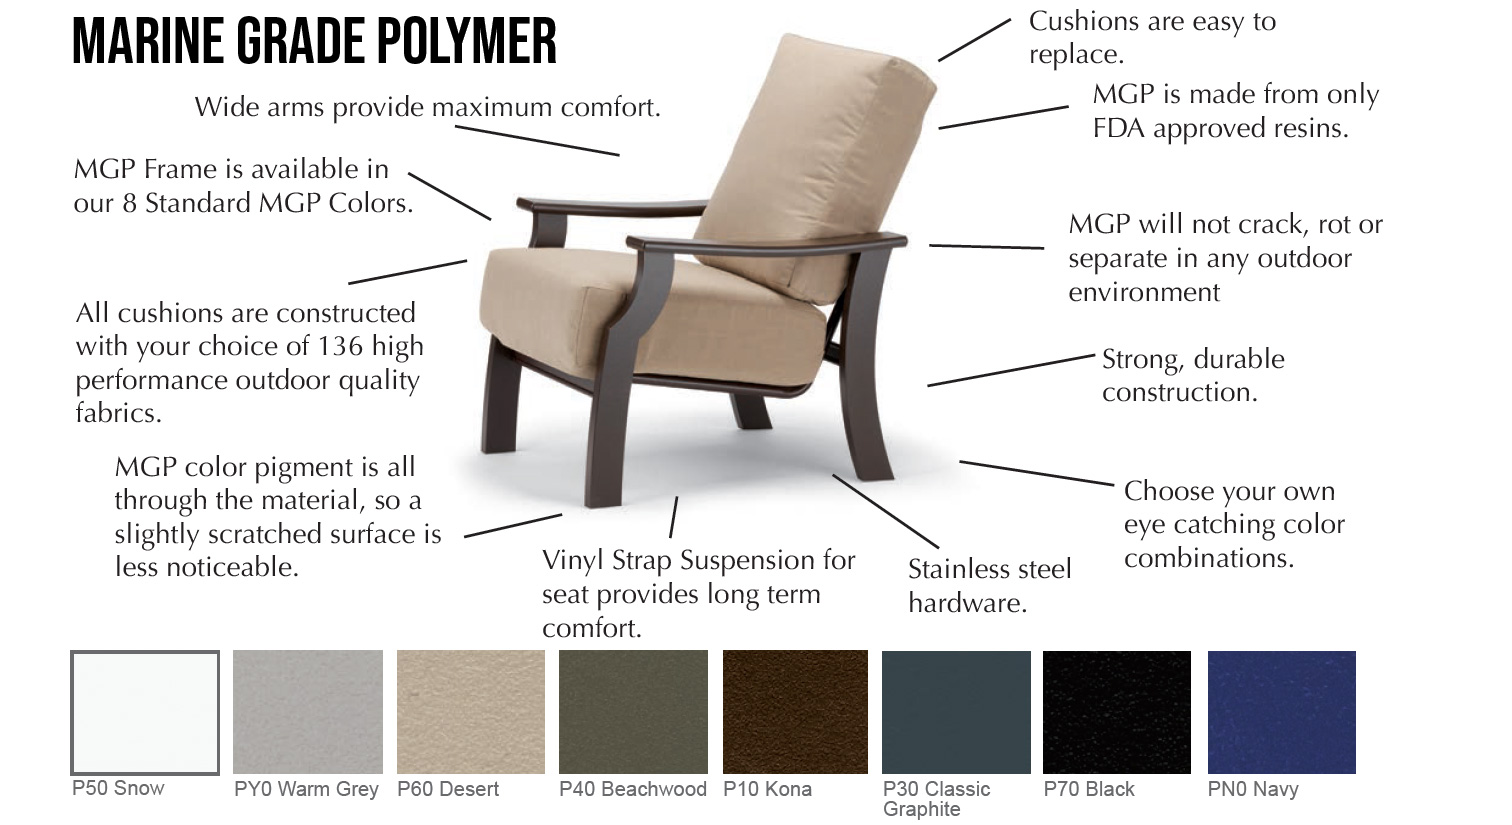 marine-grade-polymer-1.jpg